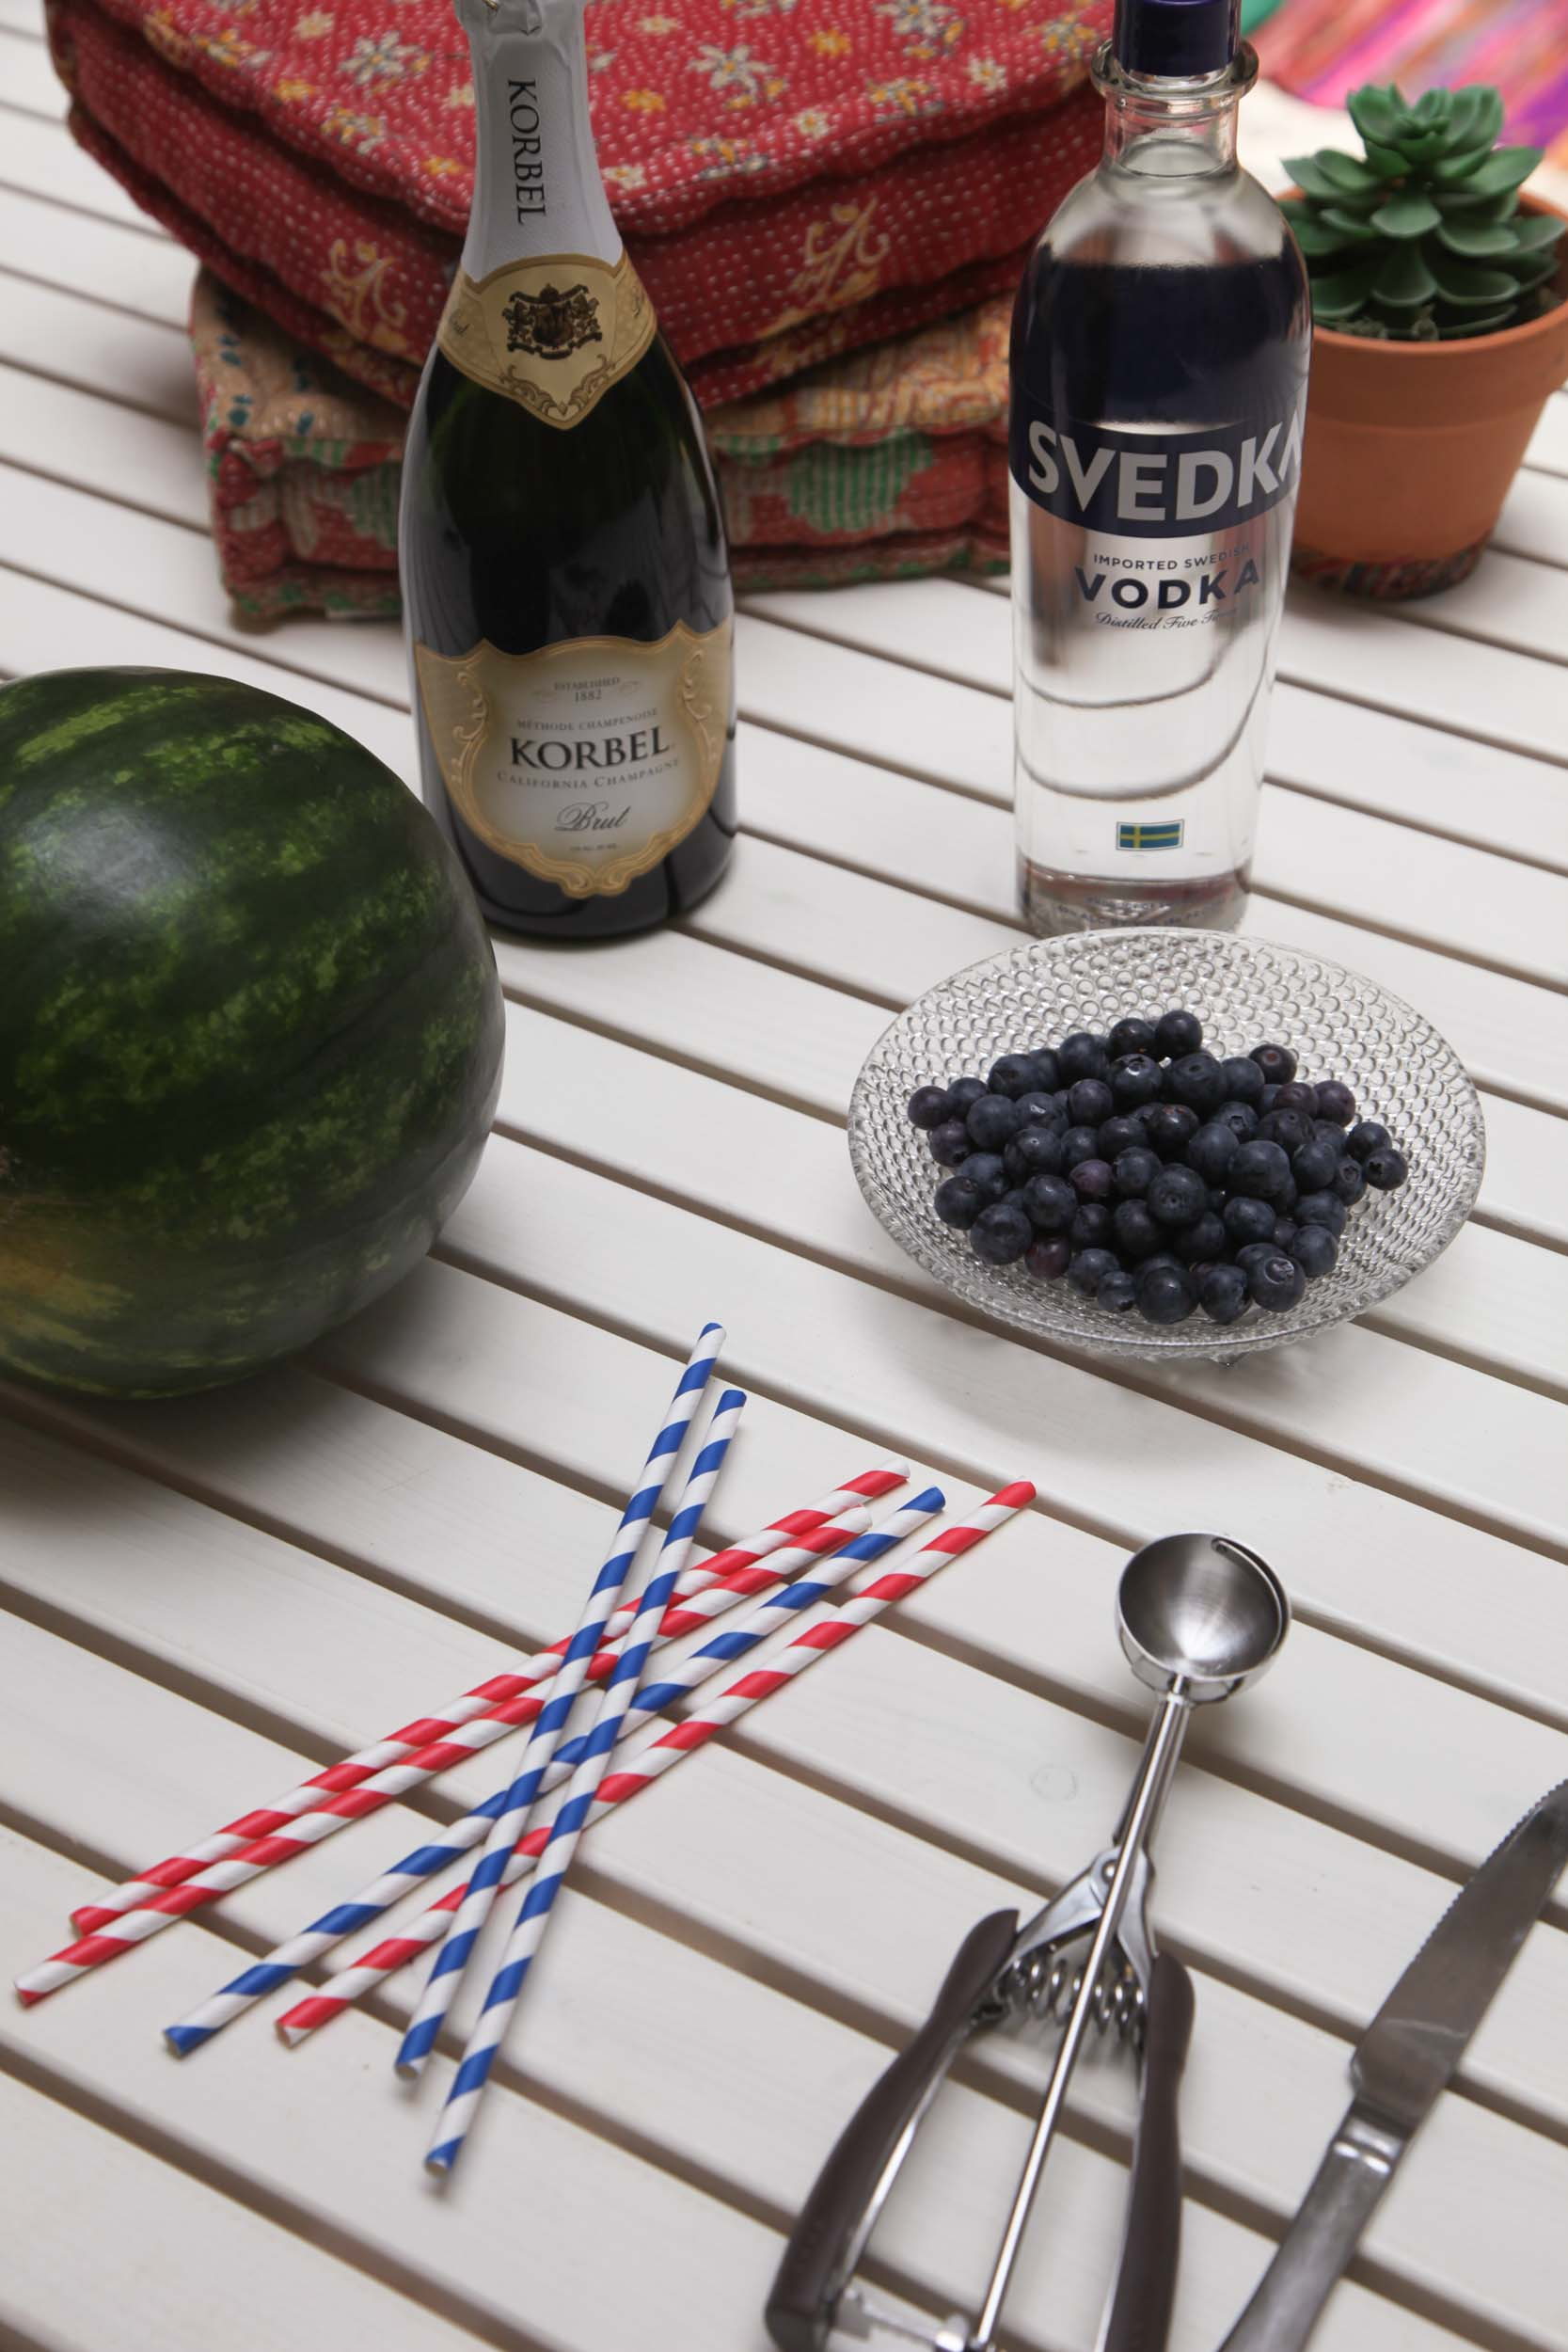 INGREDIENTS:   - Vodka           -Watermelon  -Champagne       -Blueberries   SUPPLIES:   -Knife             -Melon Scooper